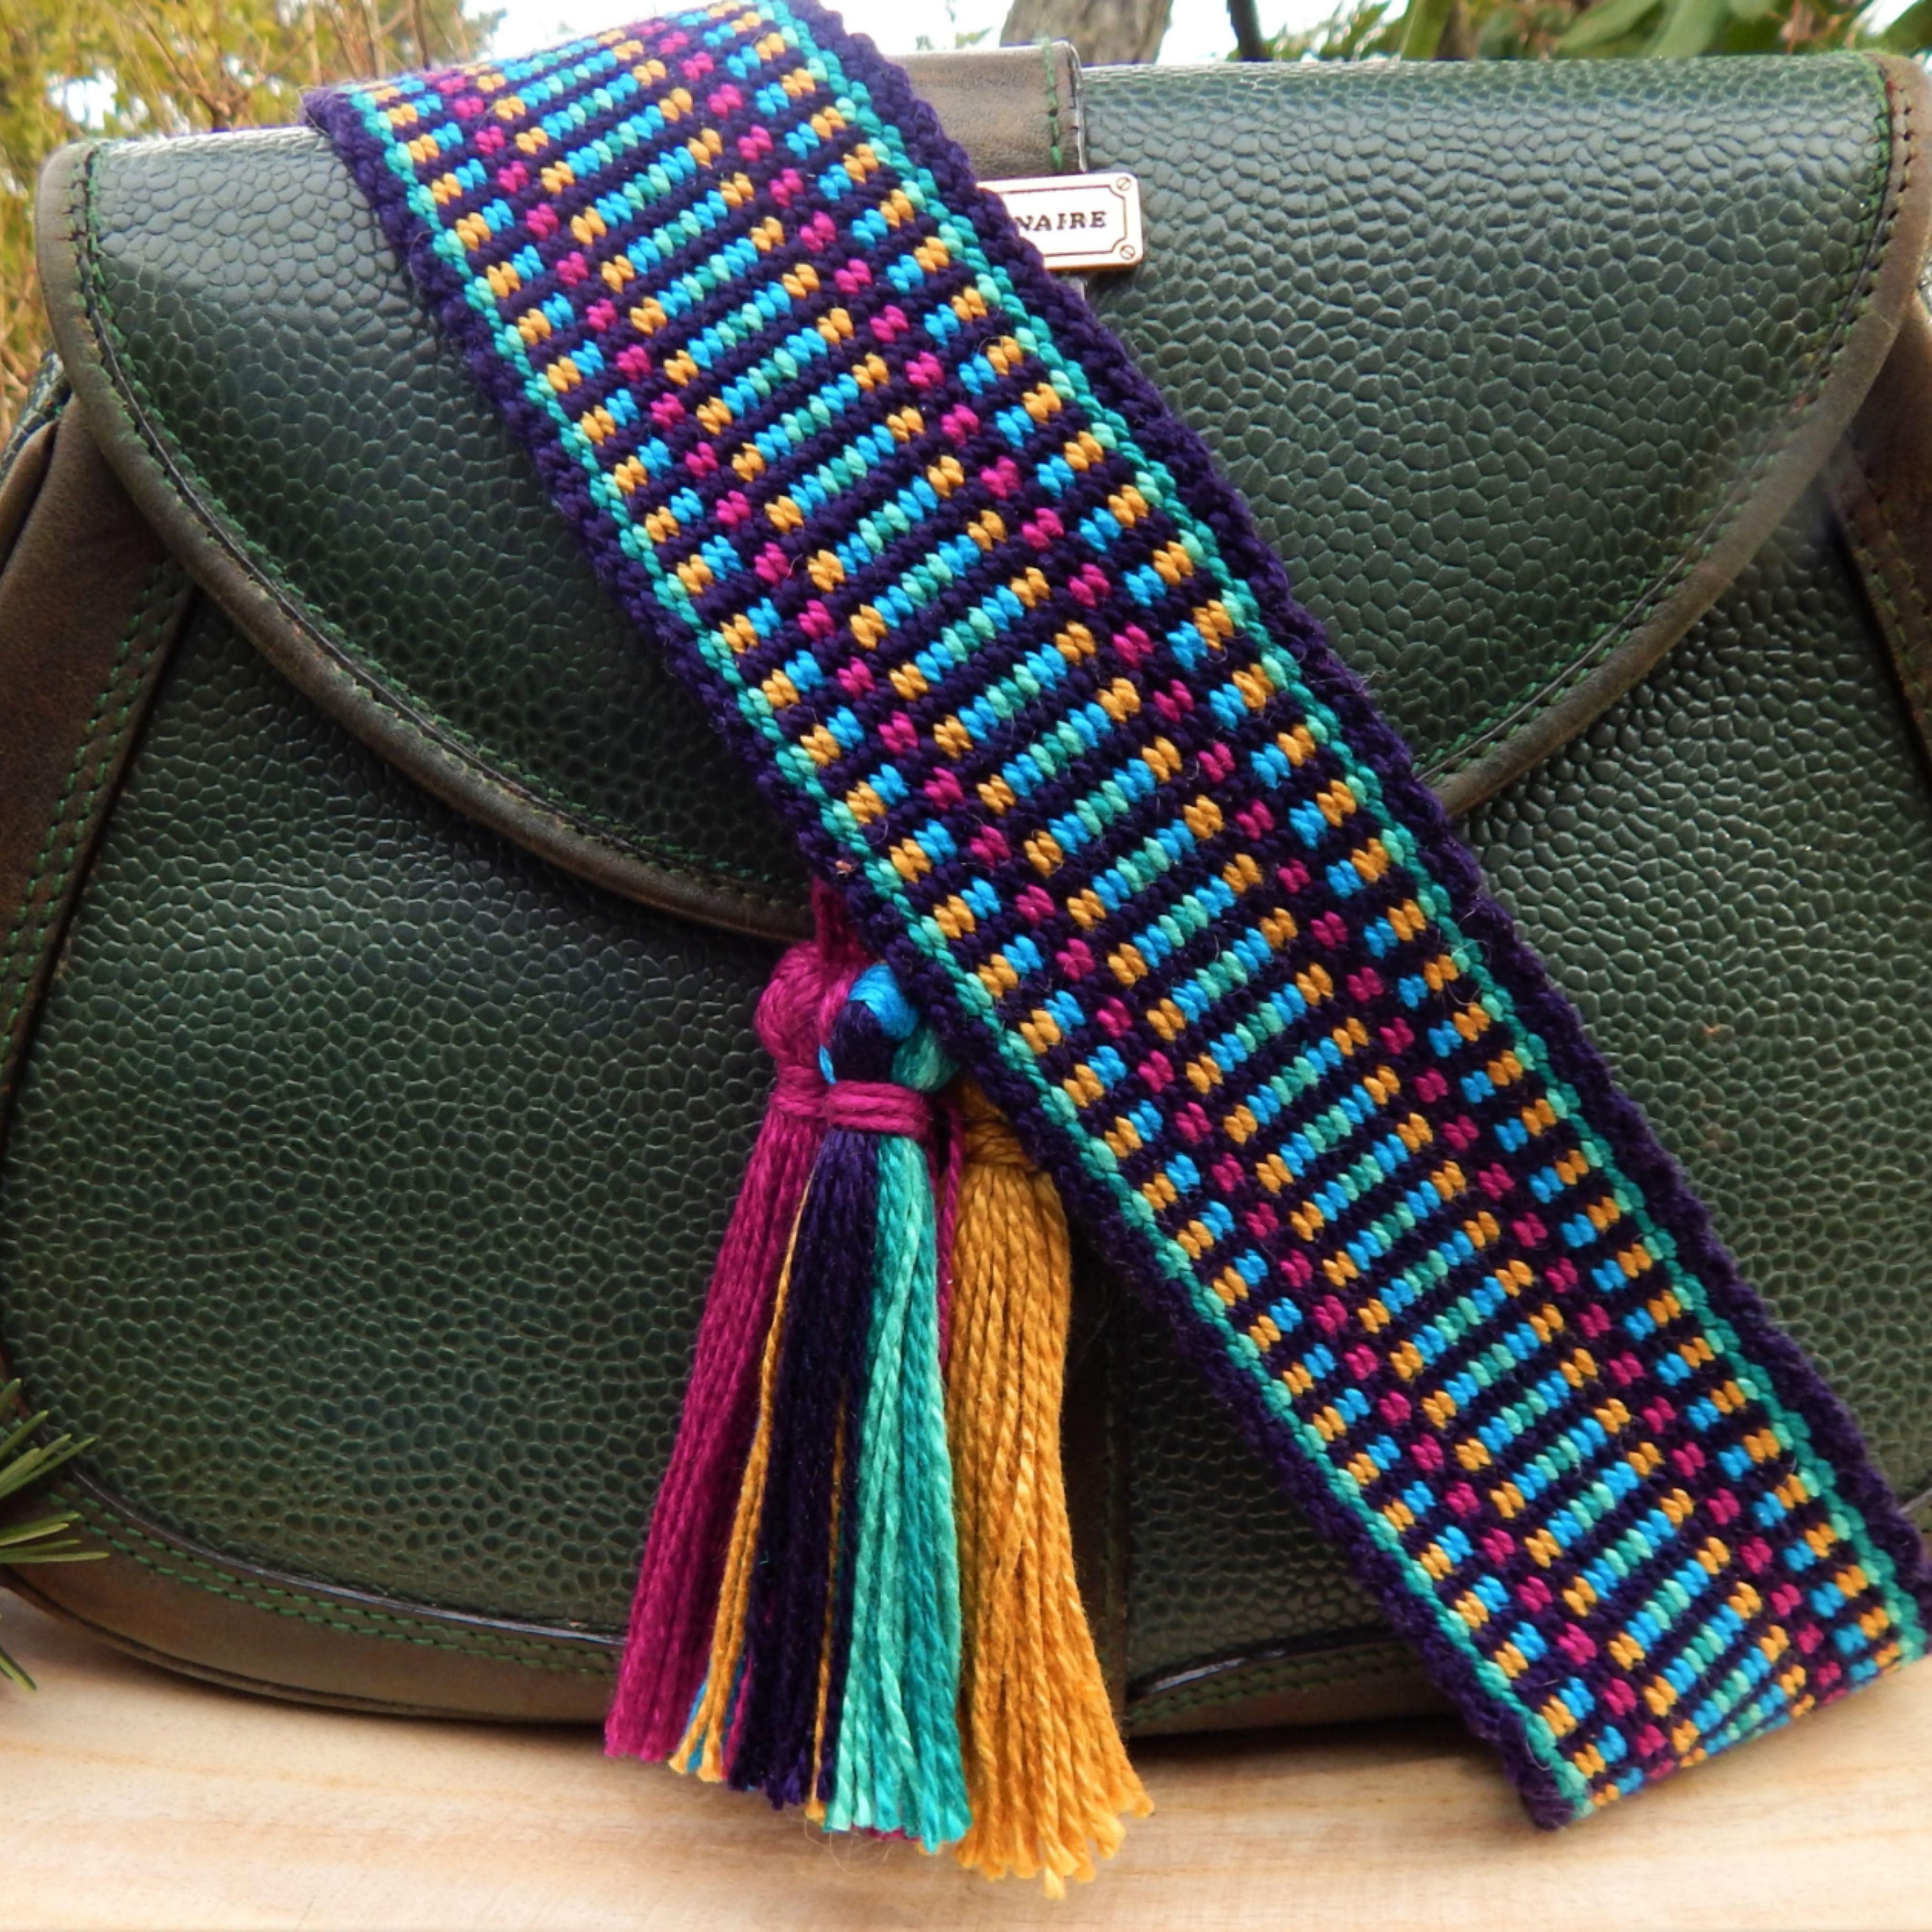 Handwoven Strap. Straps for handbags Handbag Straps Guitar strap Purse Strap Handmade bag straps Guitar Strap